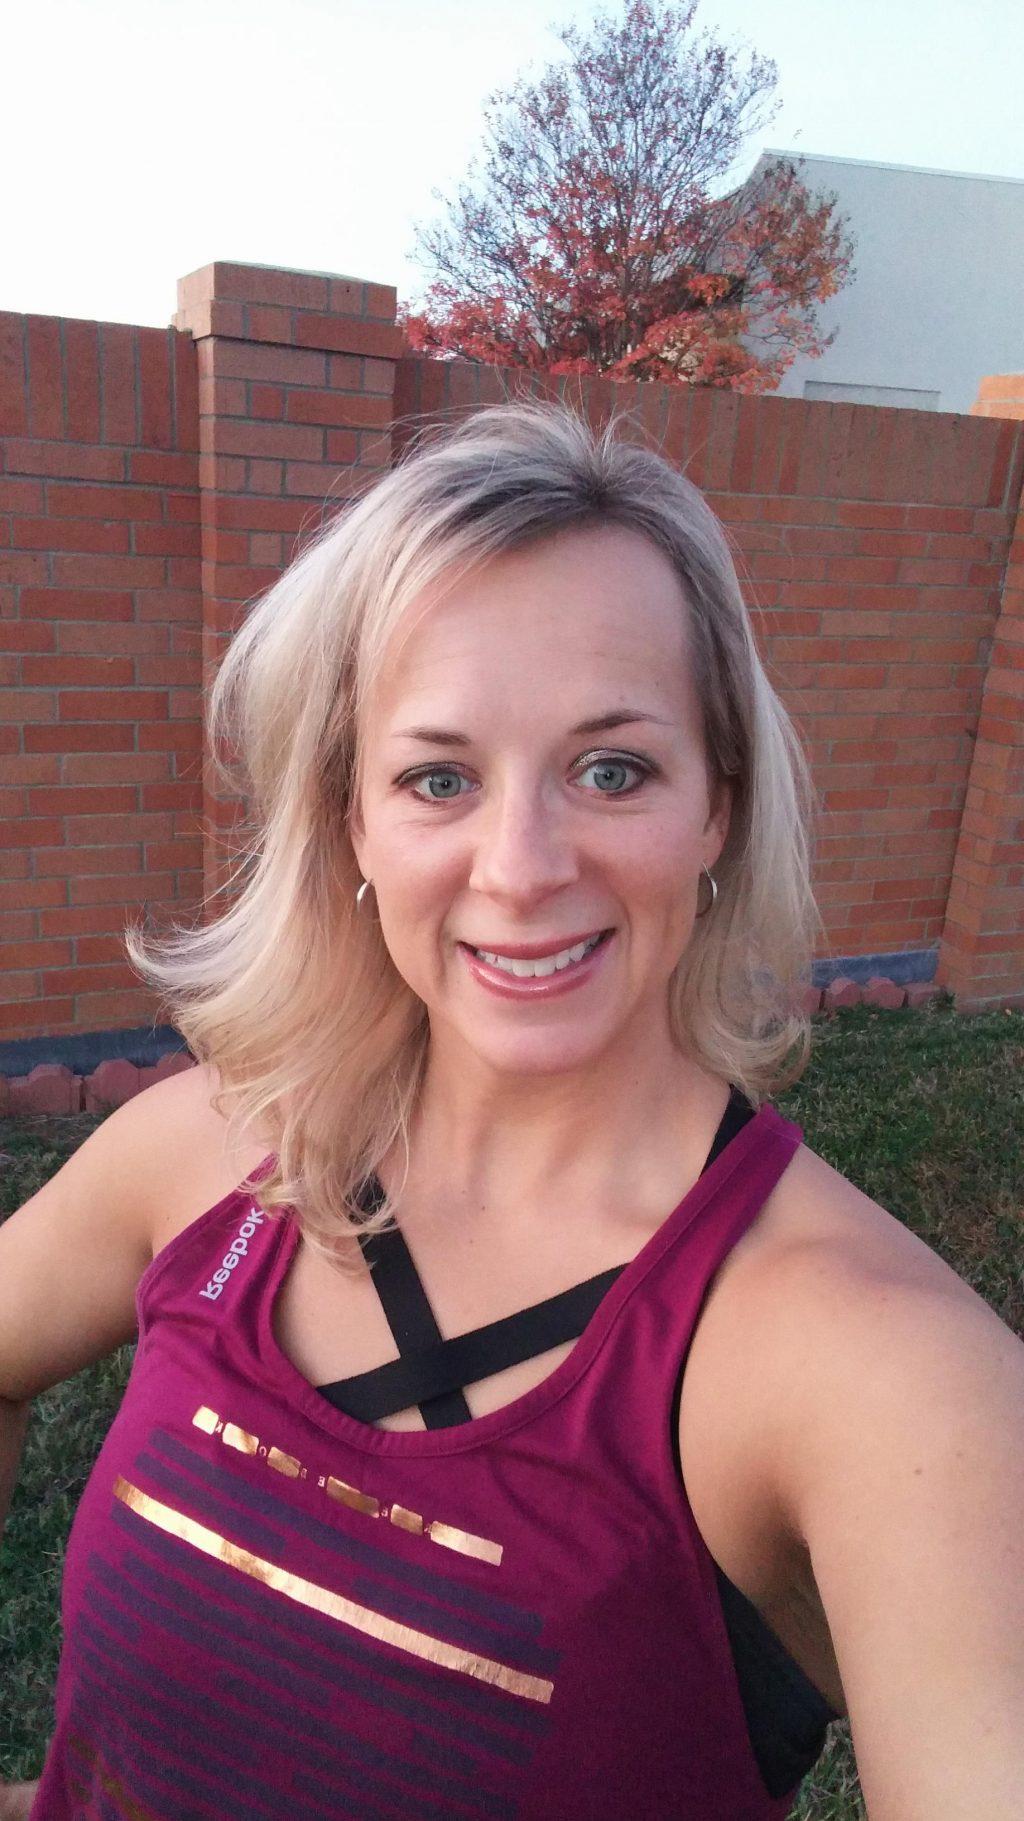 Personal Trainer Hurst, Texas - Heather Bittinger